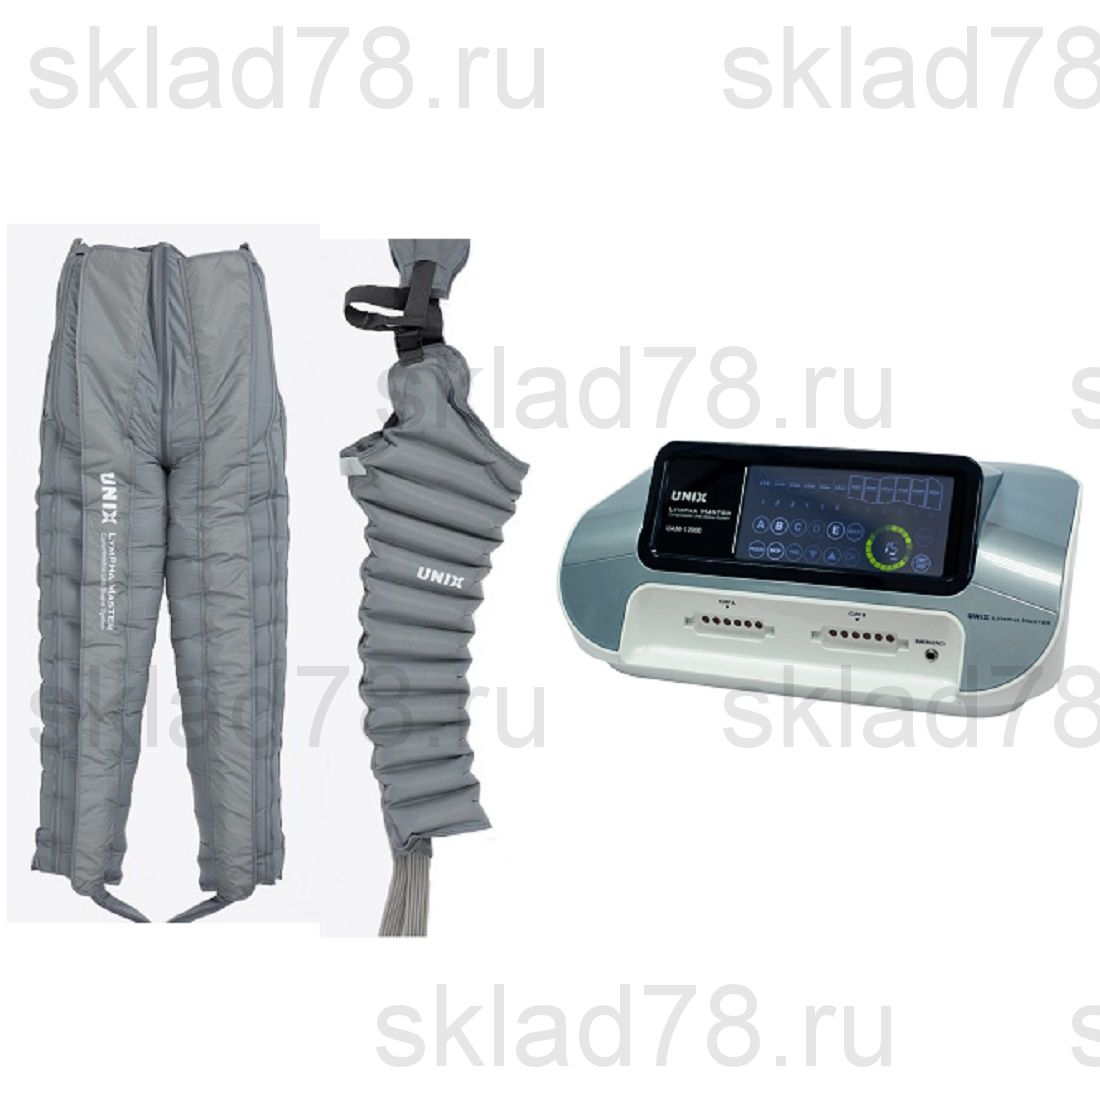 UNIX LYMPHA MASTER комплект «Аппарат + Комбинезон + Рукав» 12 камер